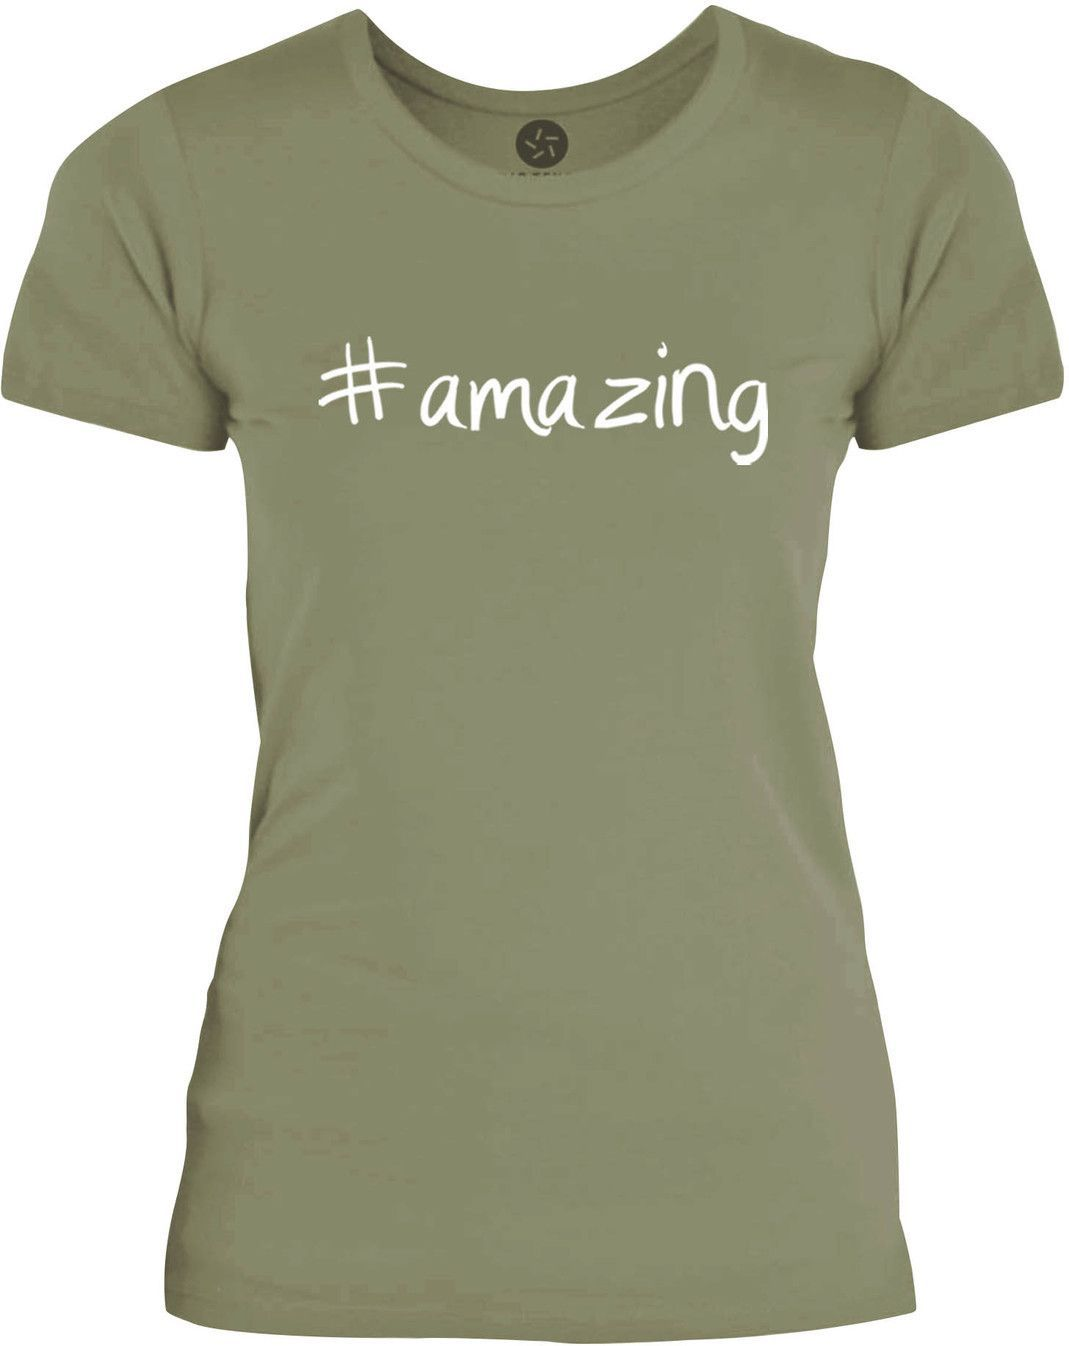 Big Texas Hastag Amazing (White) Womens Fine Jersey T-Shirt